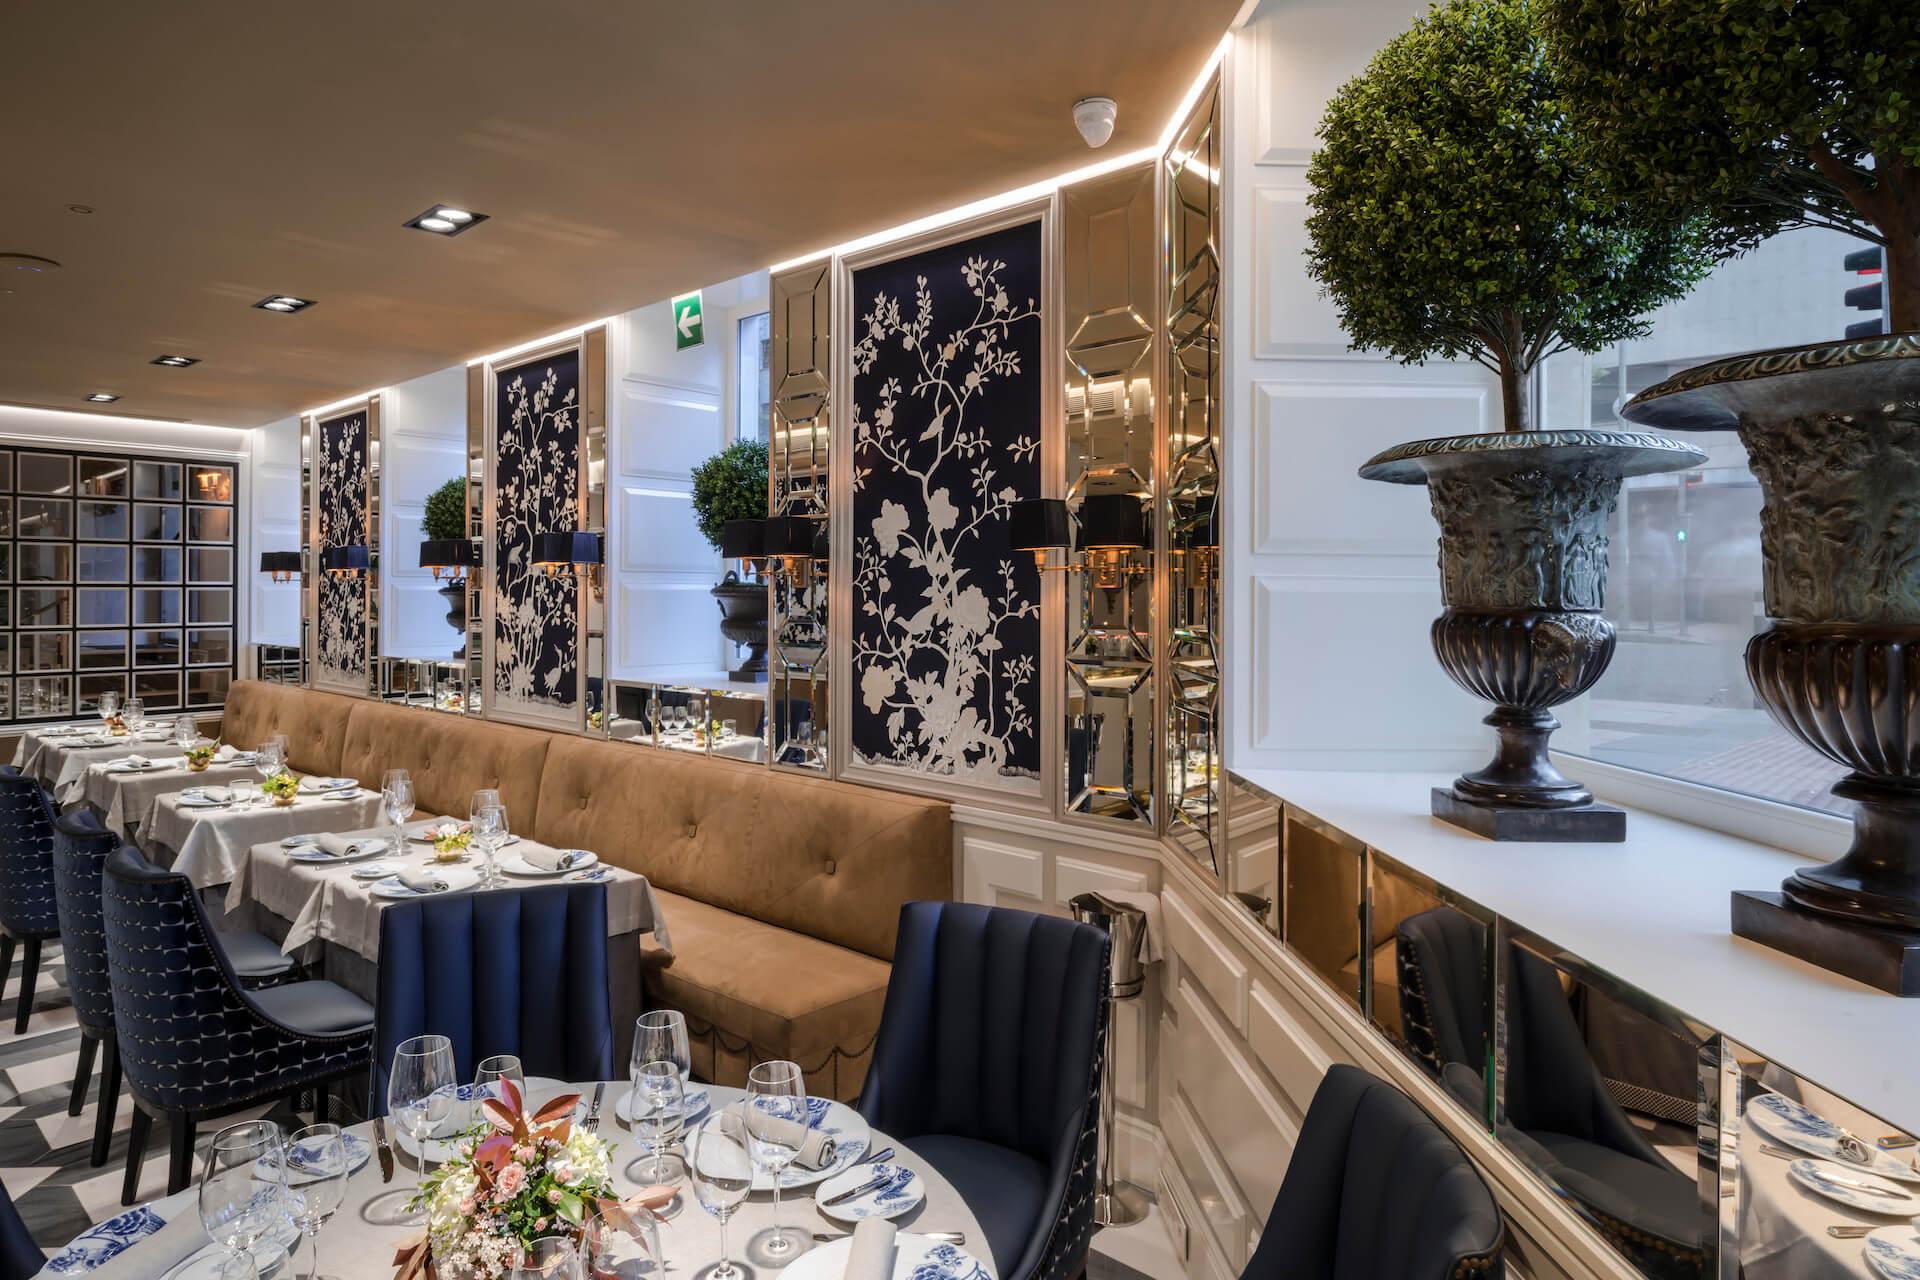 mejores restaurantes románticos Madrid - Haroma